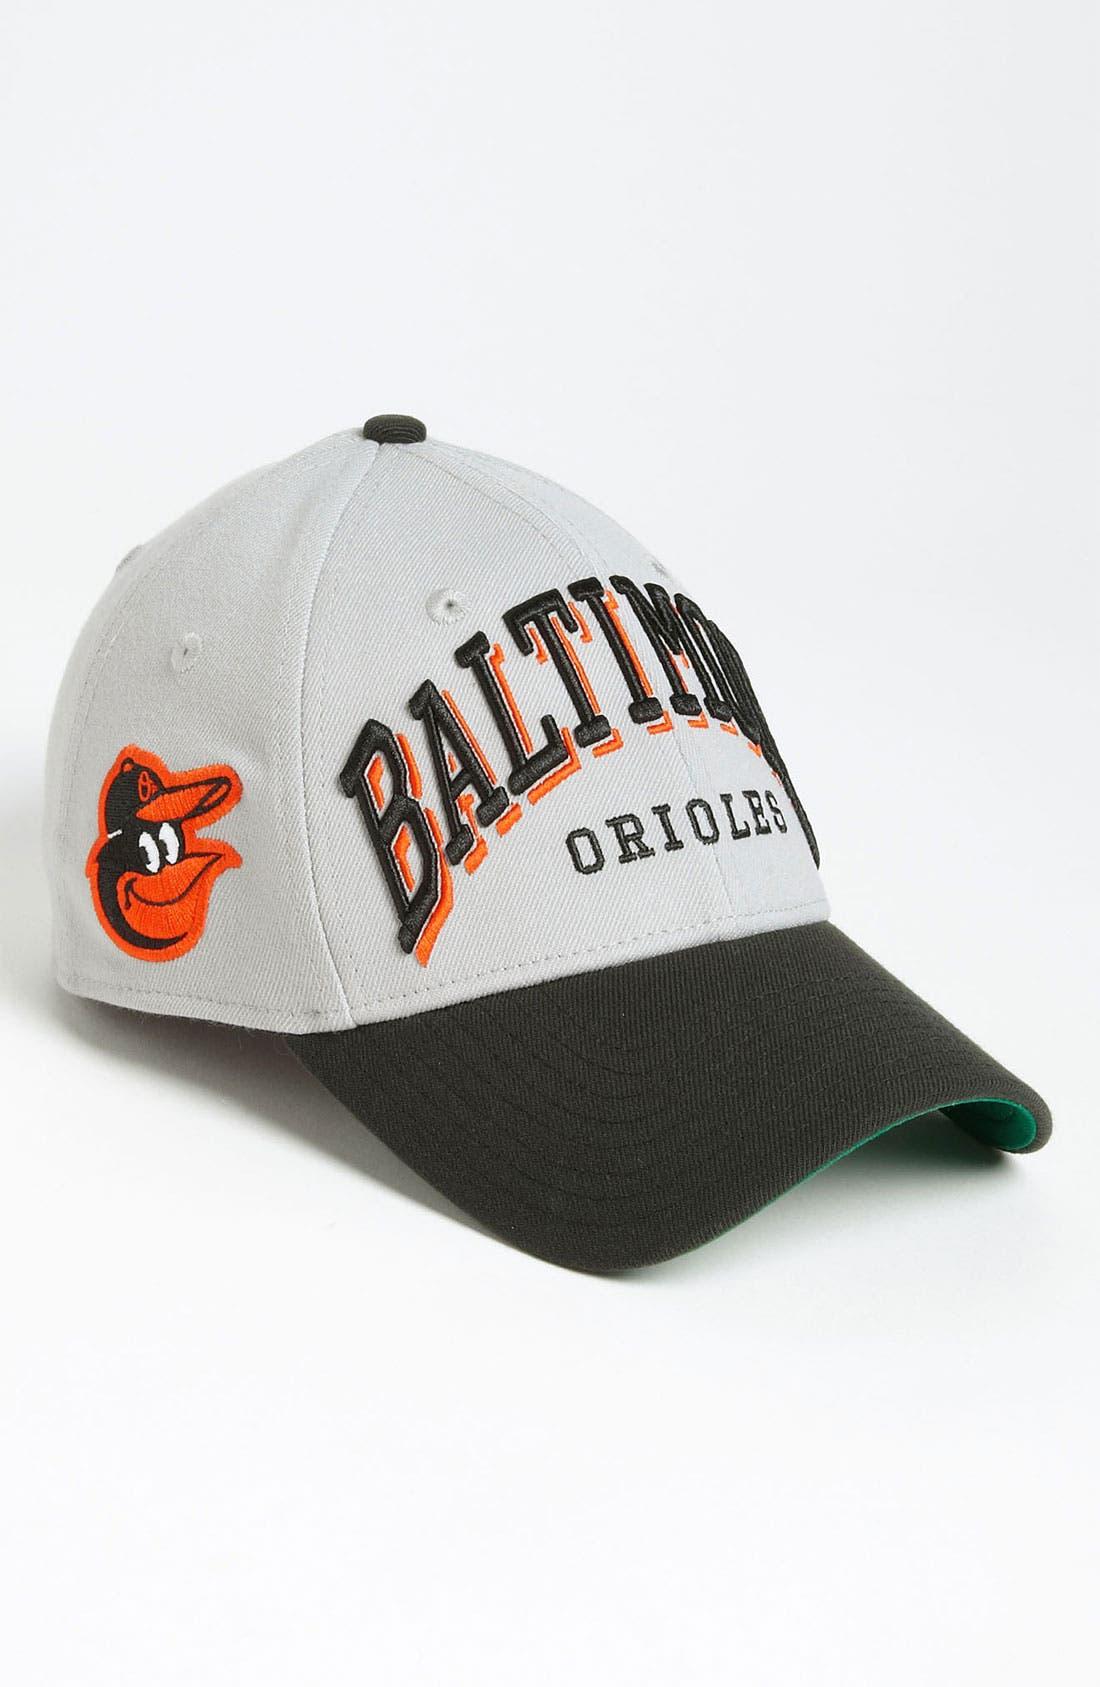 Alternate Image 2  - New Era Cap 'Baltimore Orioles - Arch Mark' Fitted Baseball Cap